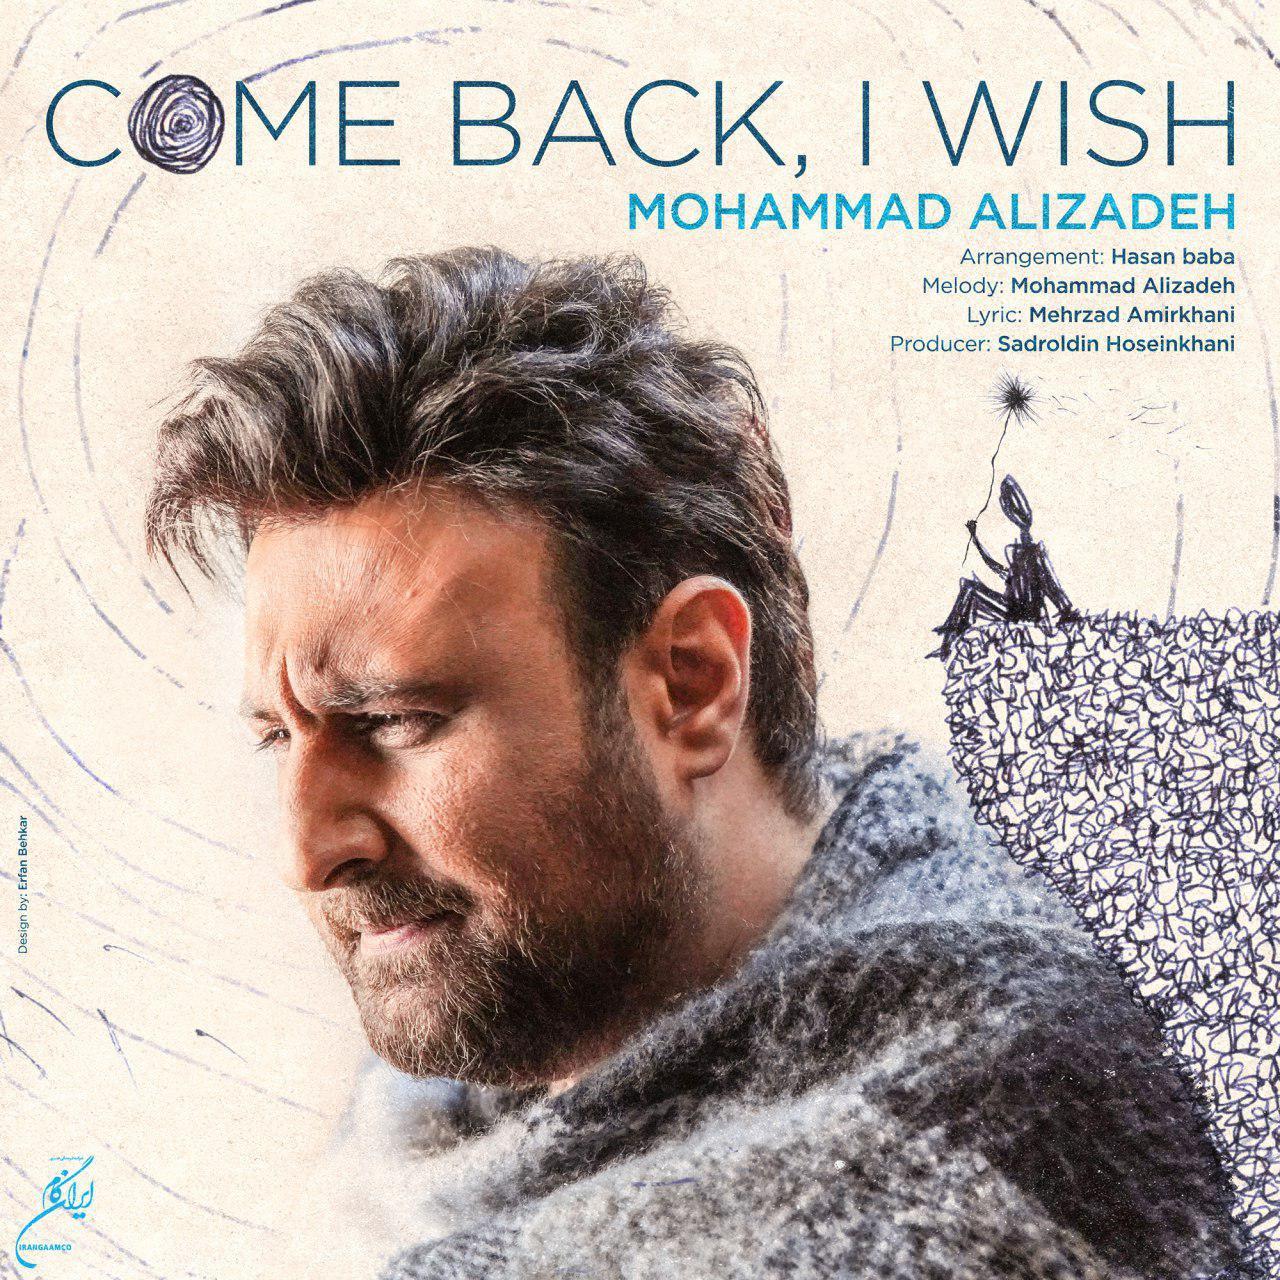 محمد عليزاده - برگردي اي کاش